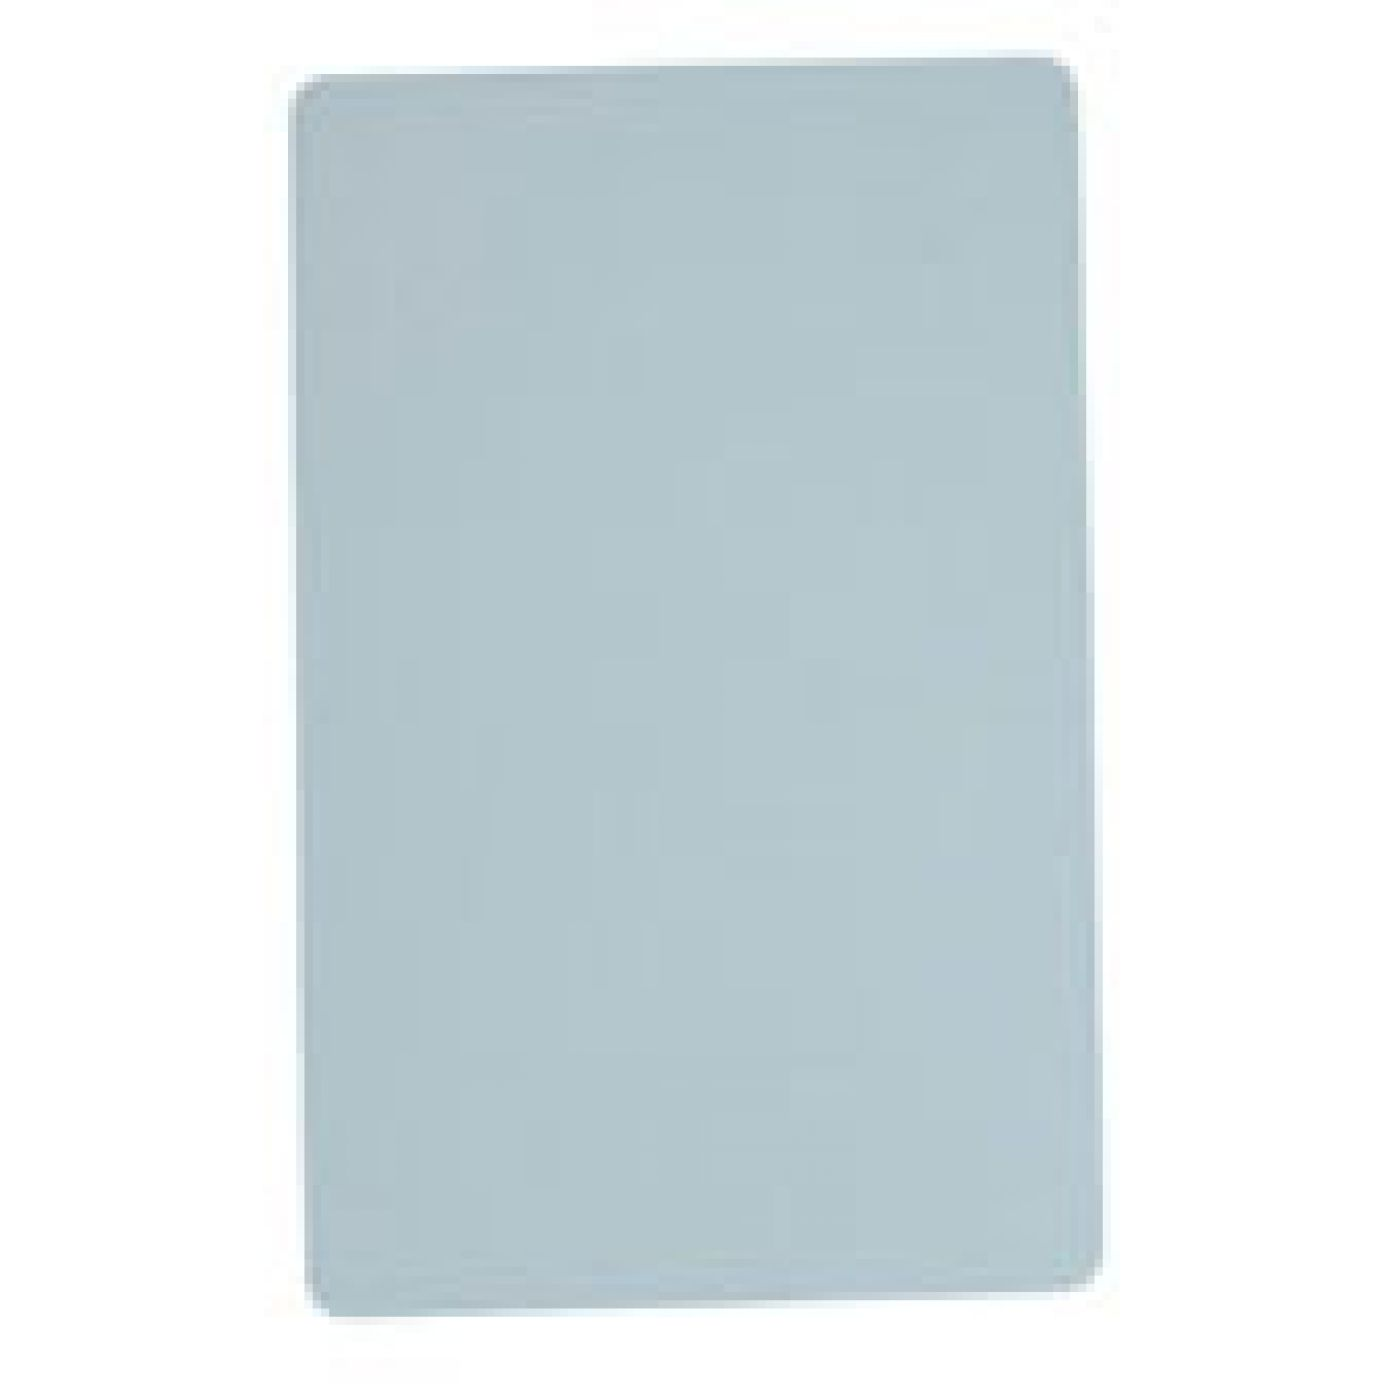 Mifare ISO Card